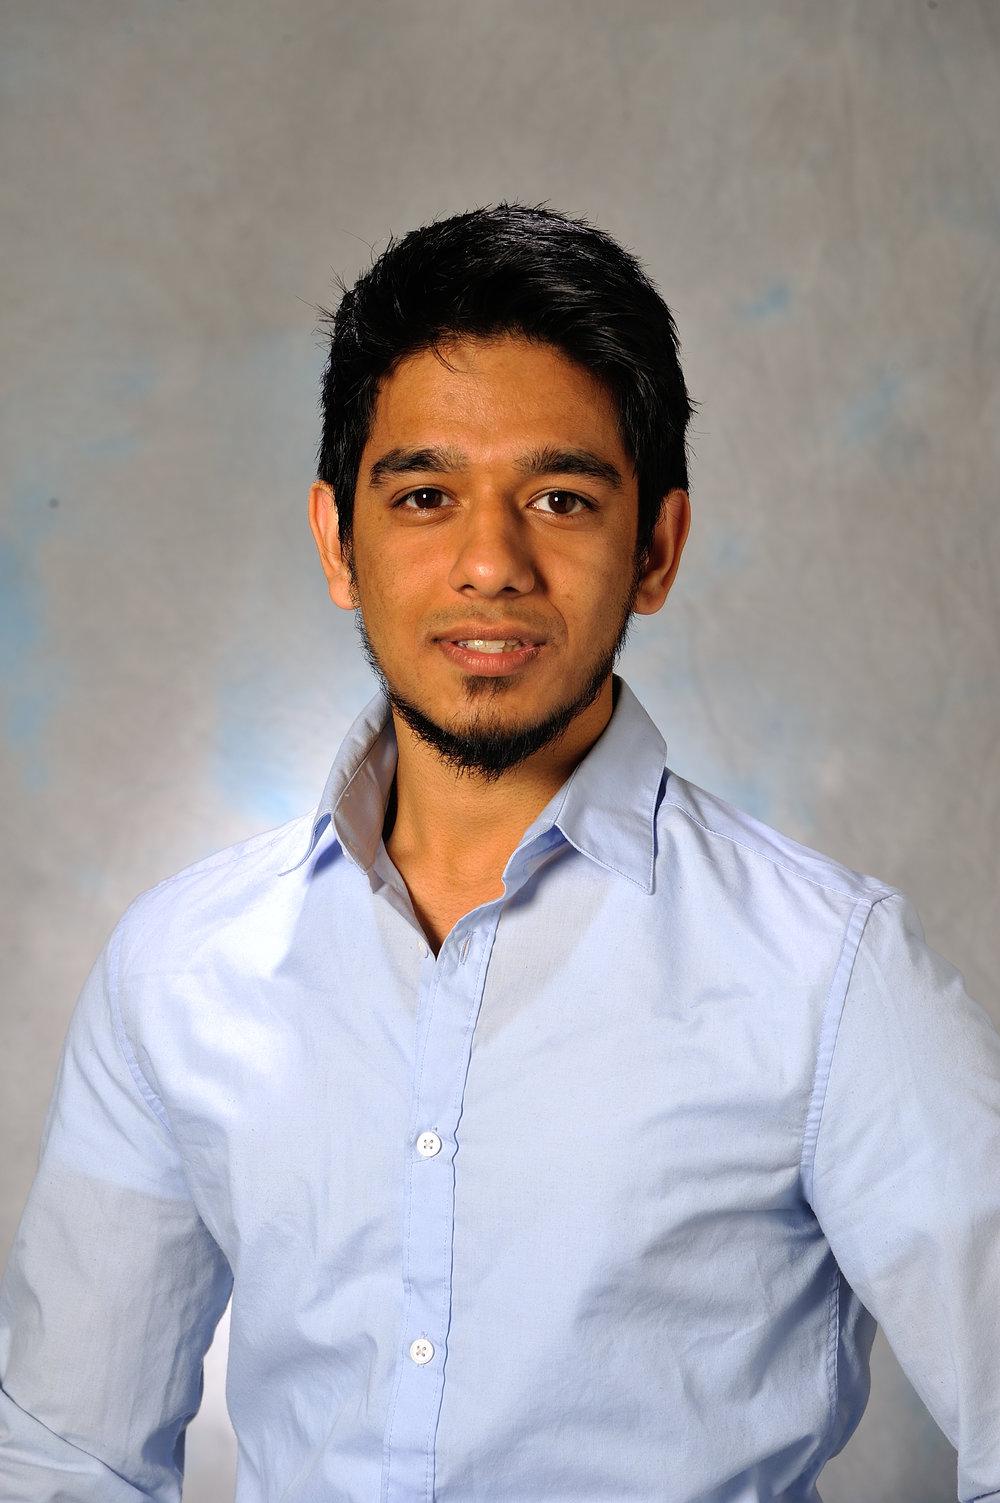 Ibrahim Chowdhury(P3) - Houston Methodist MILE InternIPSA President '16-'17SSHP Secretary '16-'17SCCP Orientation Chair '16-'17IPSA Junior Service Chair '15-'16Dean's Student Advisory Council Member '15-'16